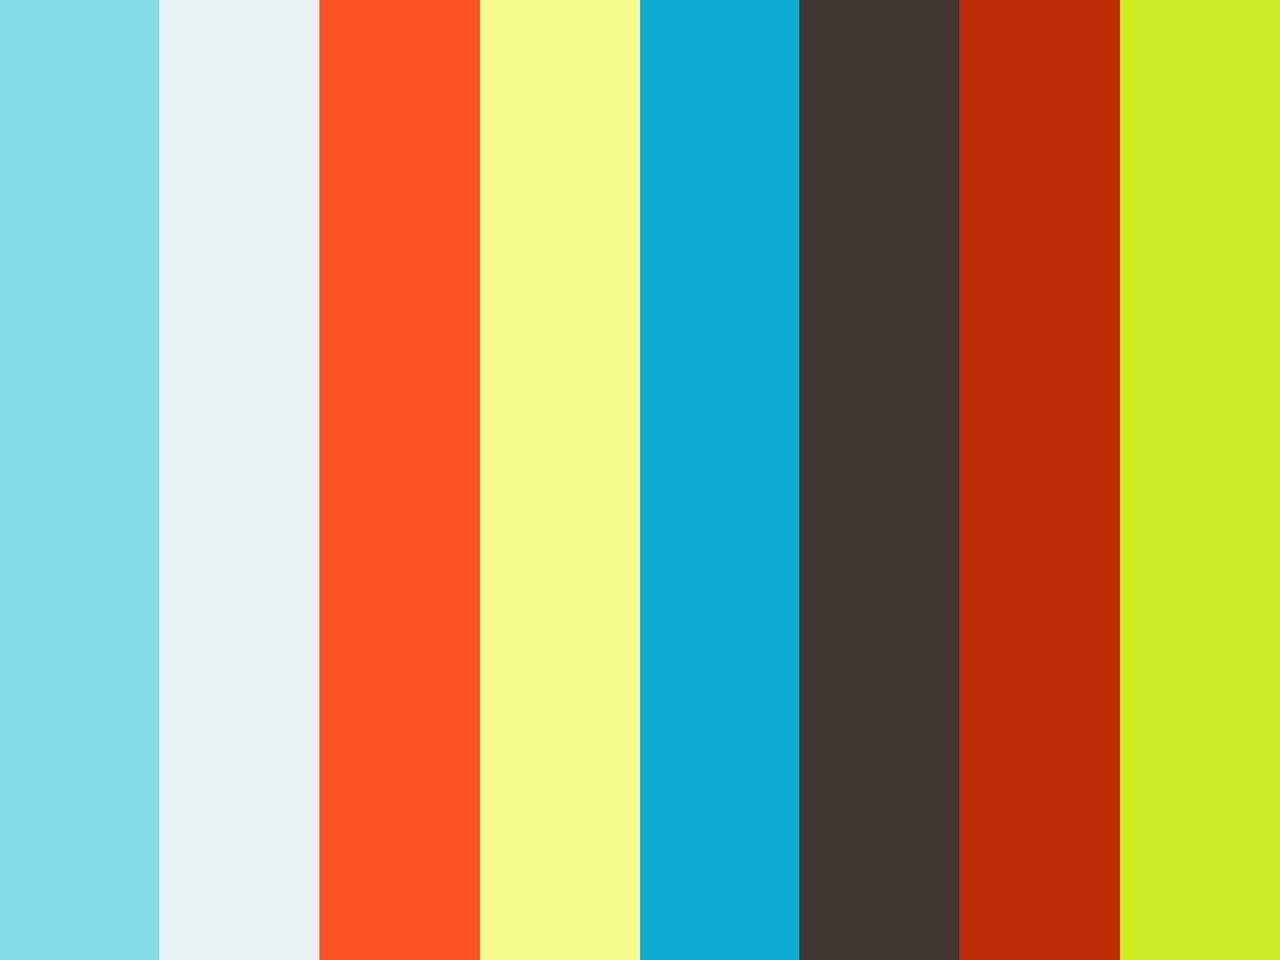 Molokai Covid19 Update - Friday, May 1, 2020